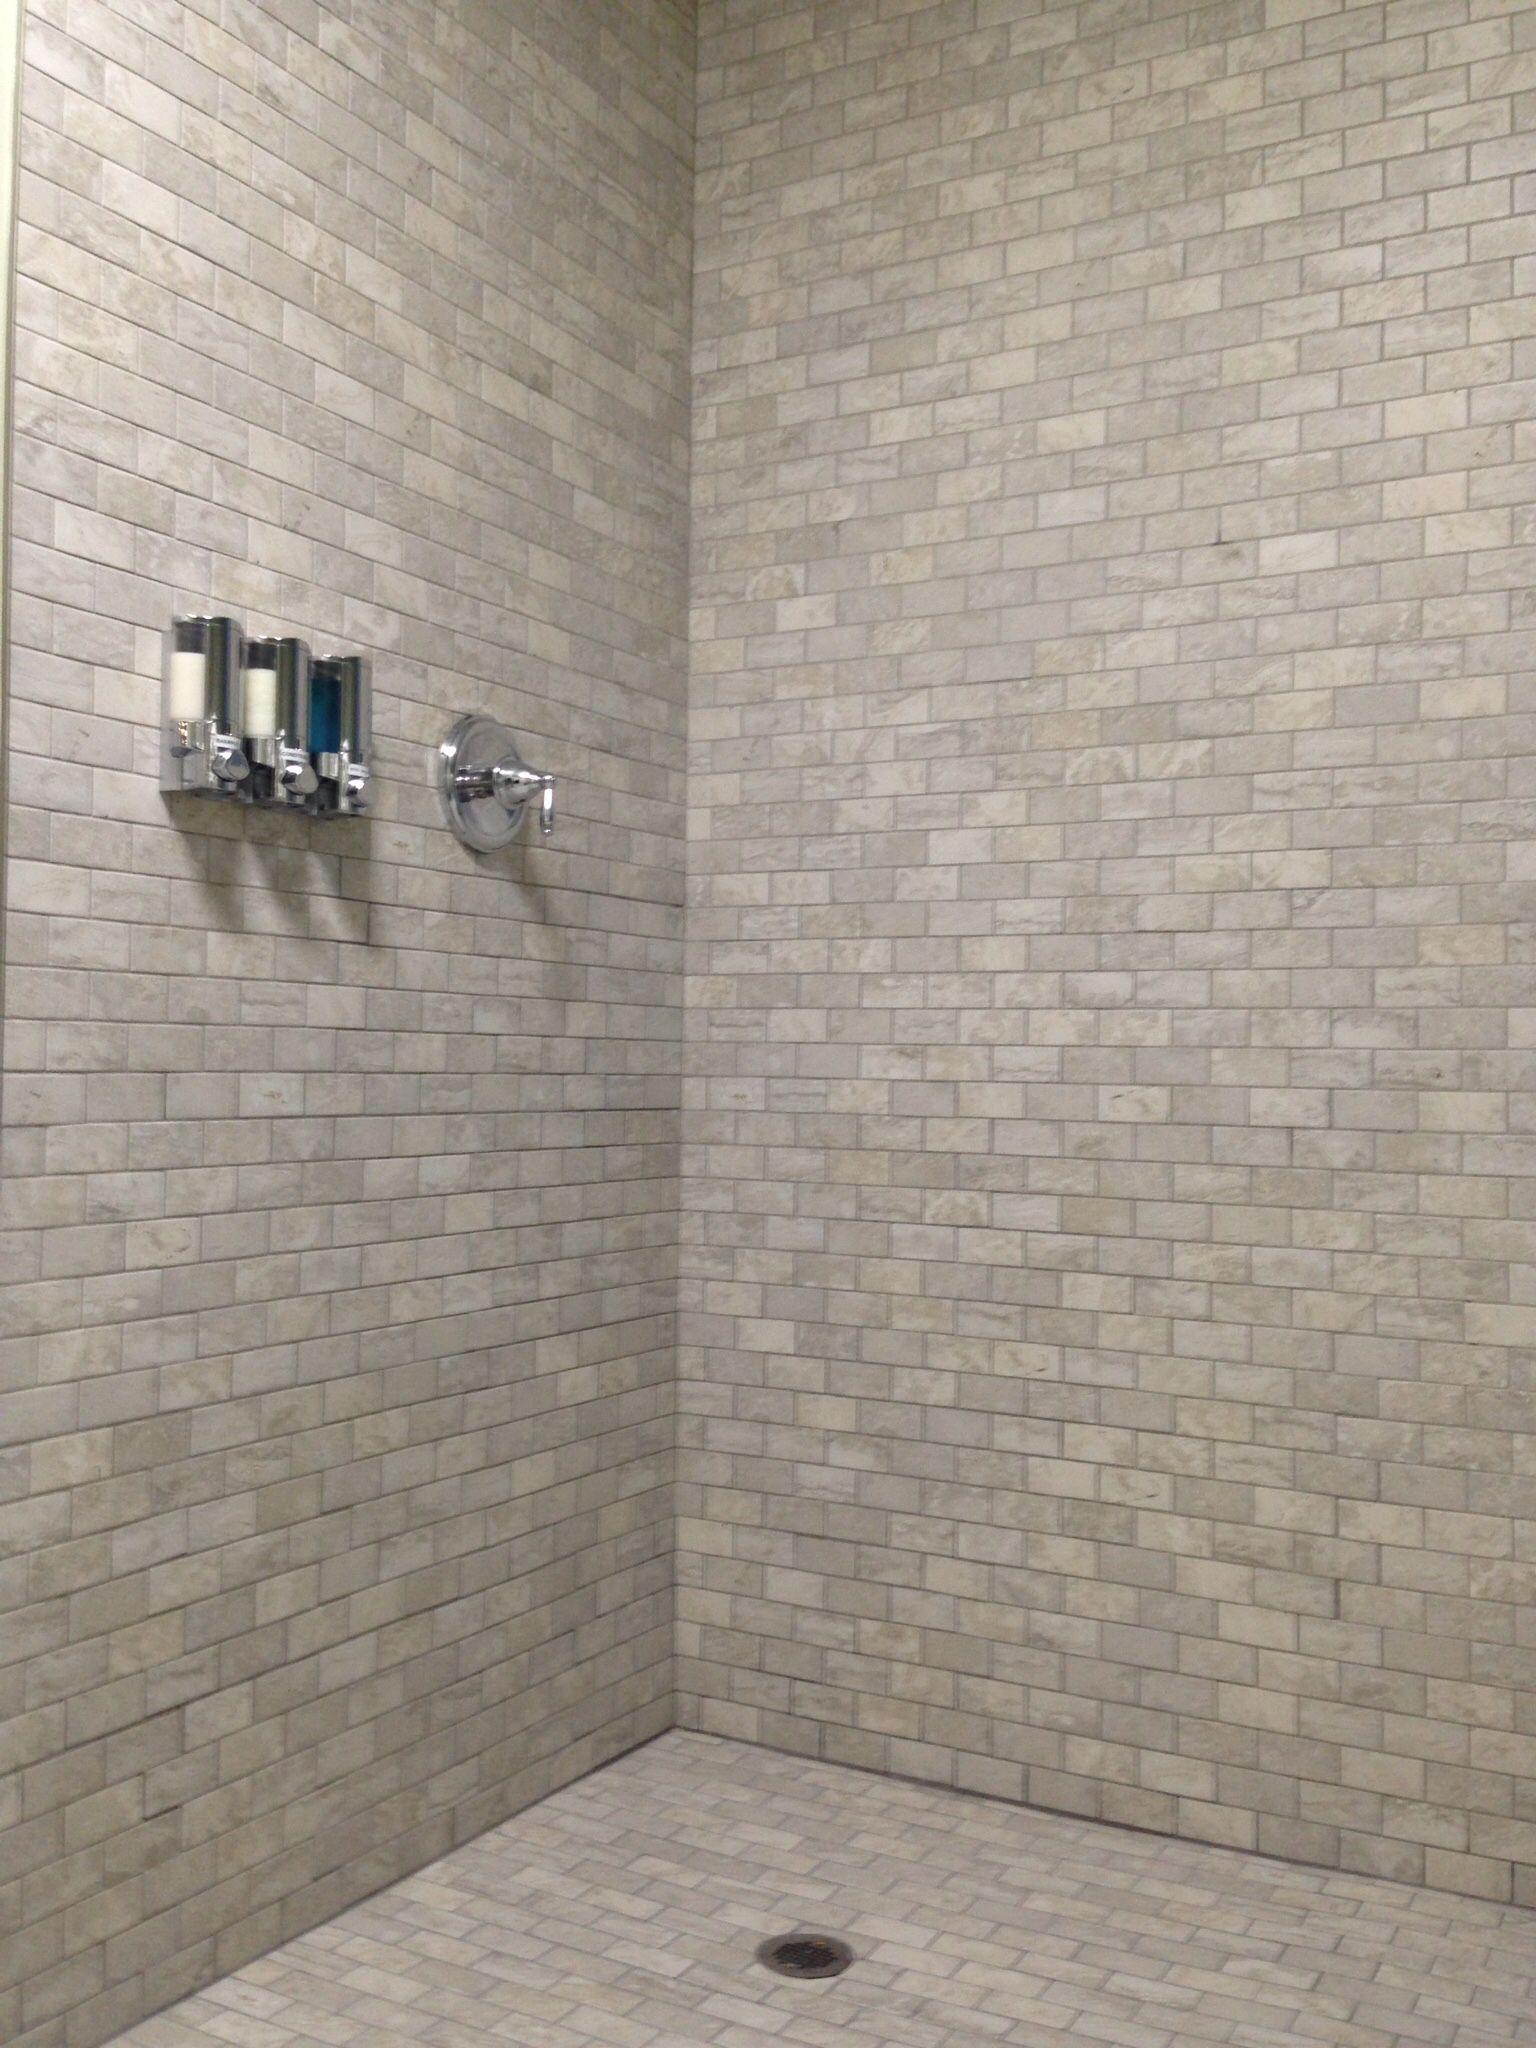 Daltile Bathroom Tile Daltiles New Invoke Collection In Copper Haze 12 X 24 Field Tile